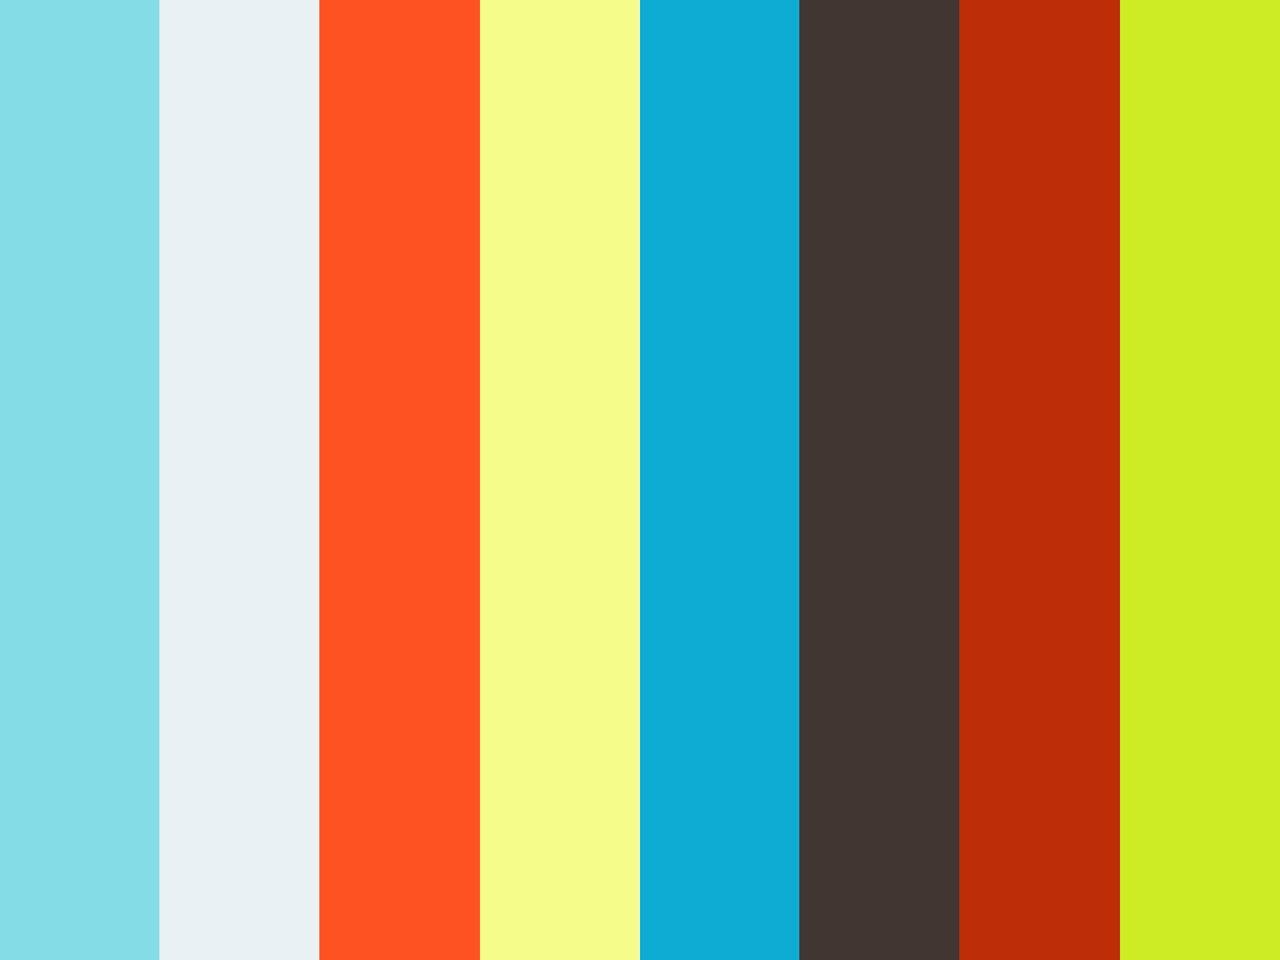 DHL_TOYS_BLUE_PRORES444-1080p@25fps_v01